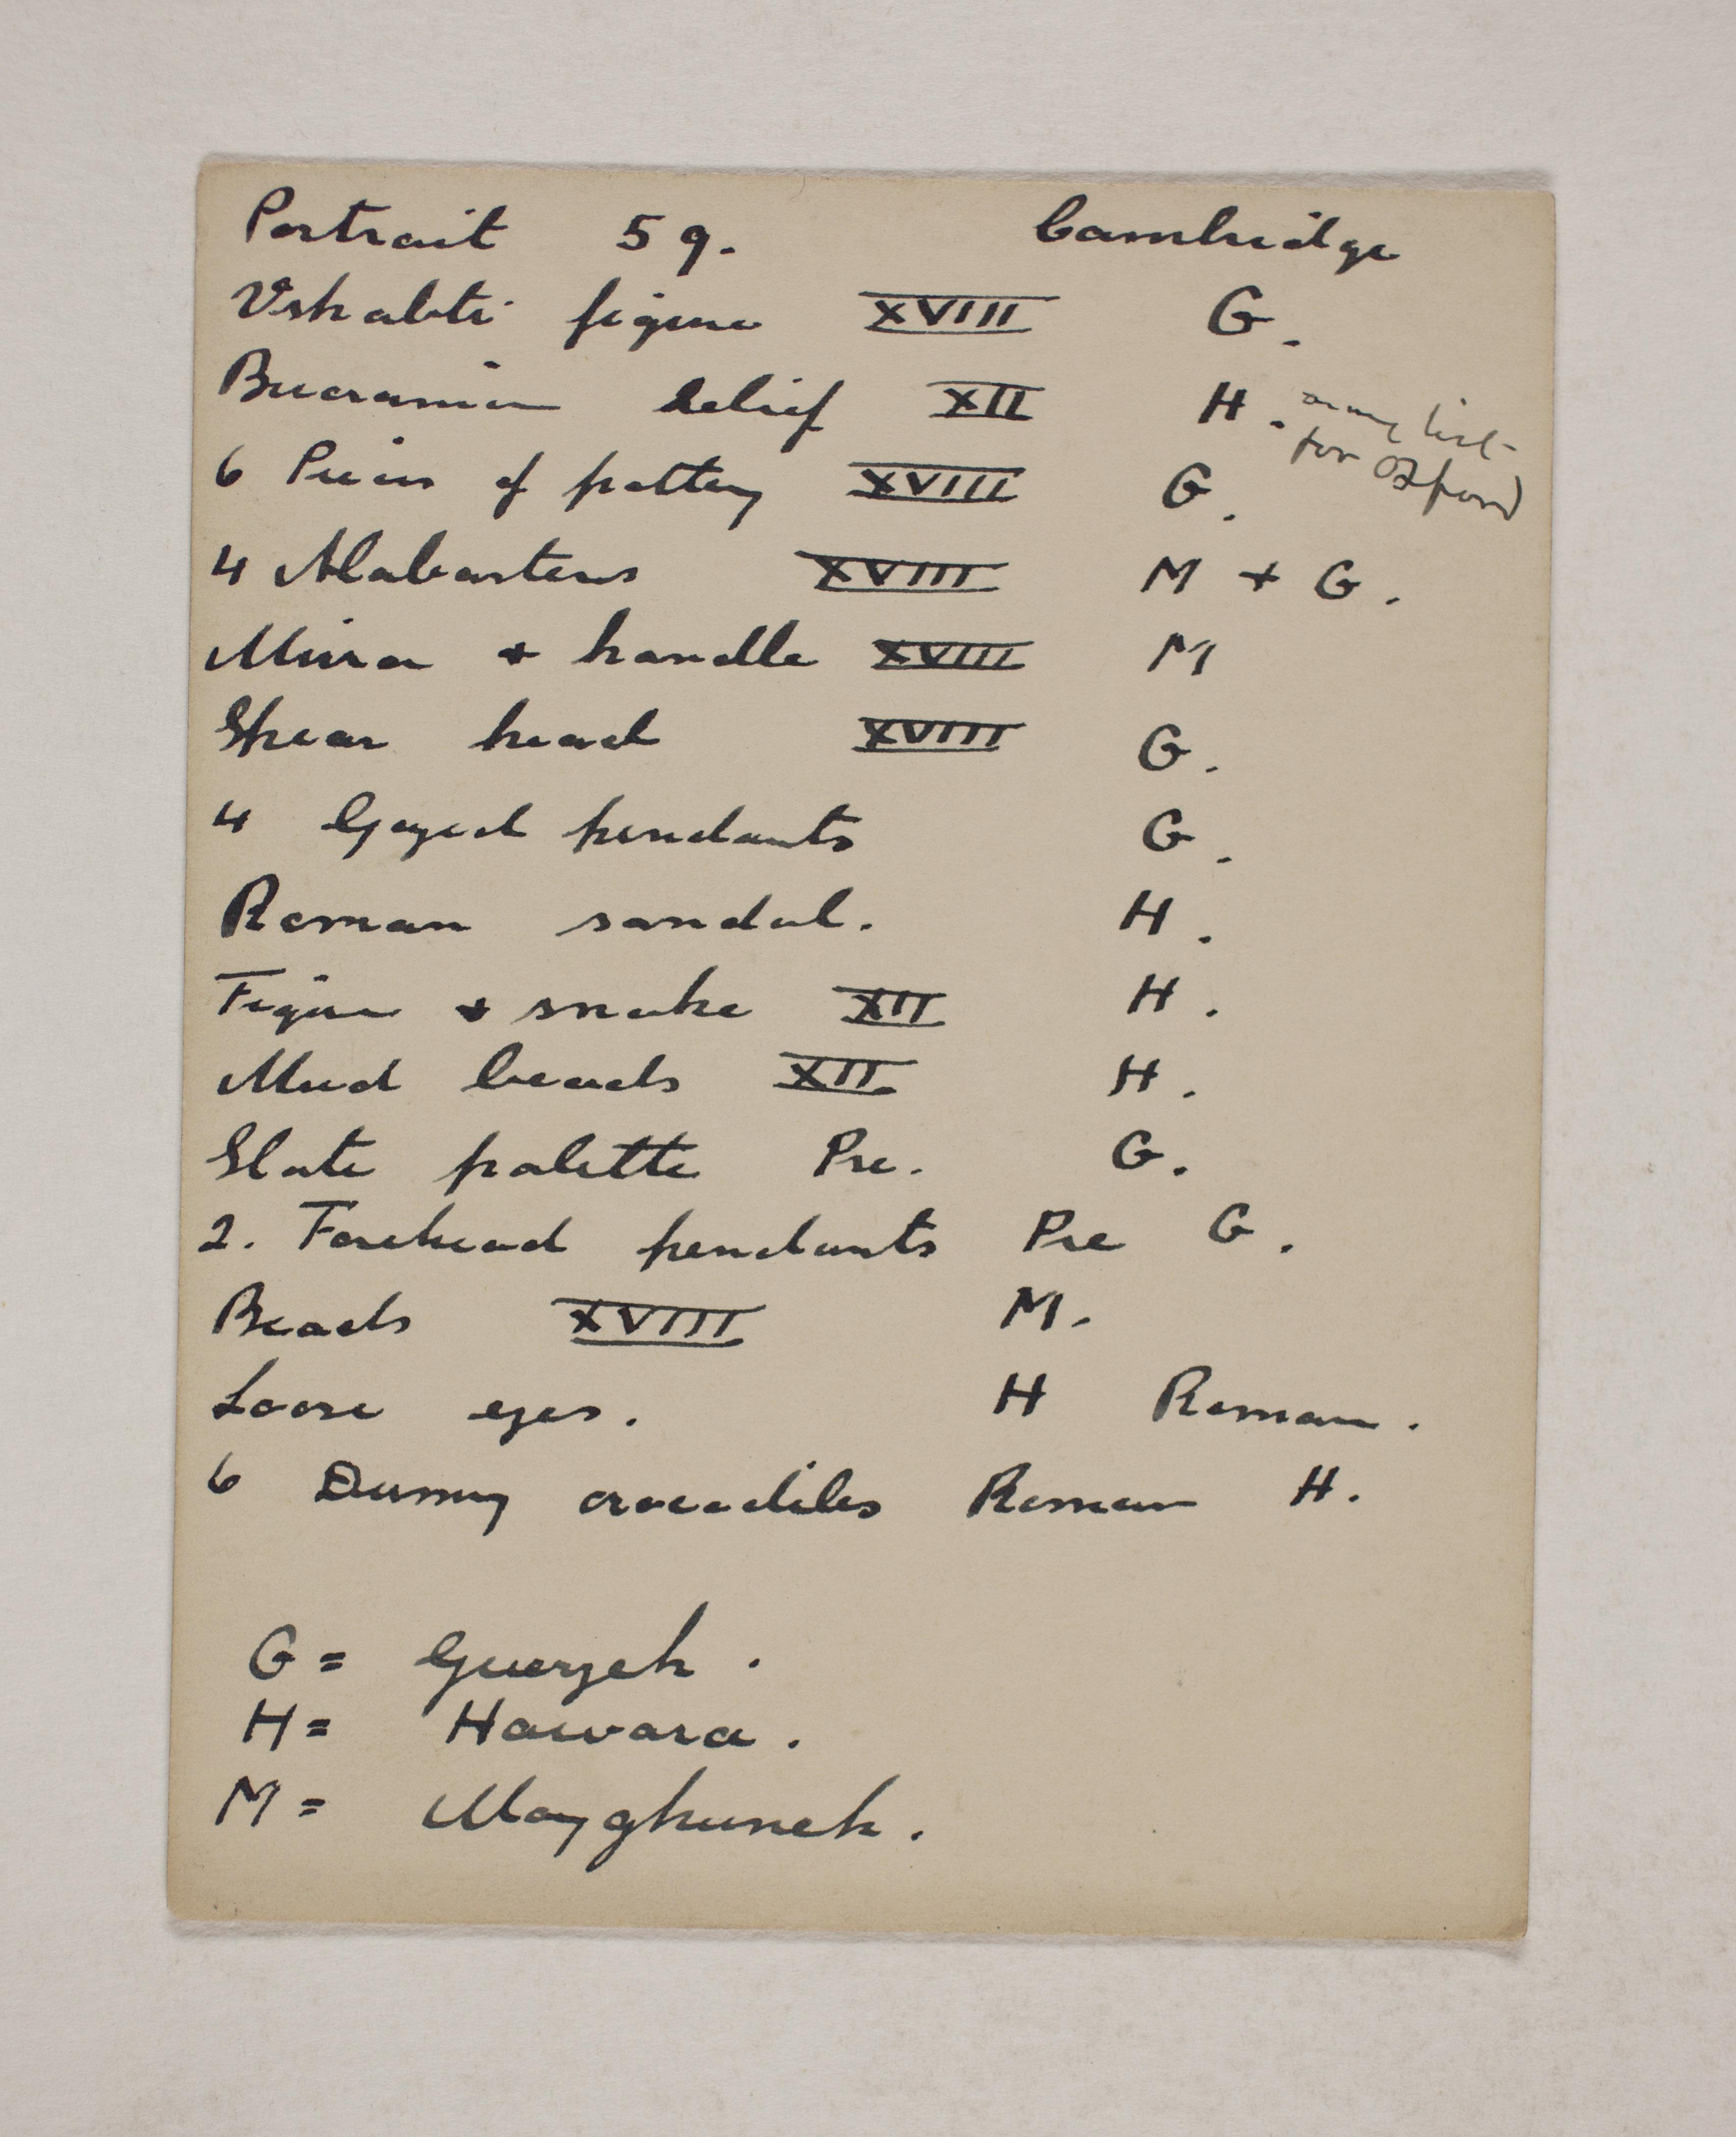 1910-11 Hawara, Gerzeh, Memphis, Mazghuneh Individual institution list  PMA/WFP1/D/19/19